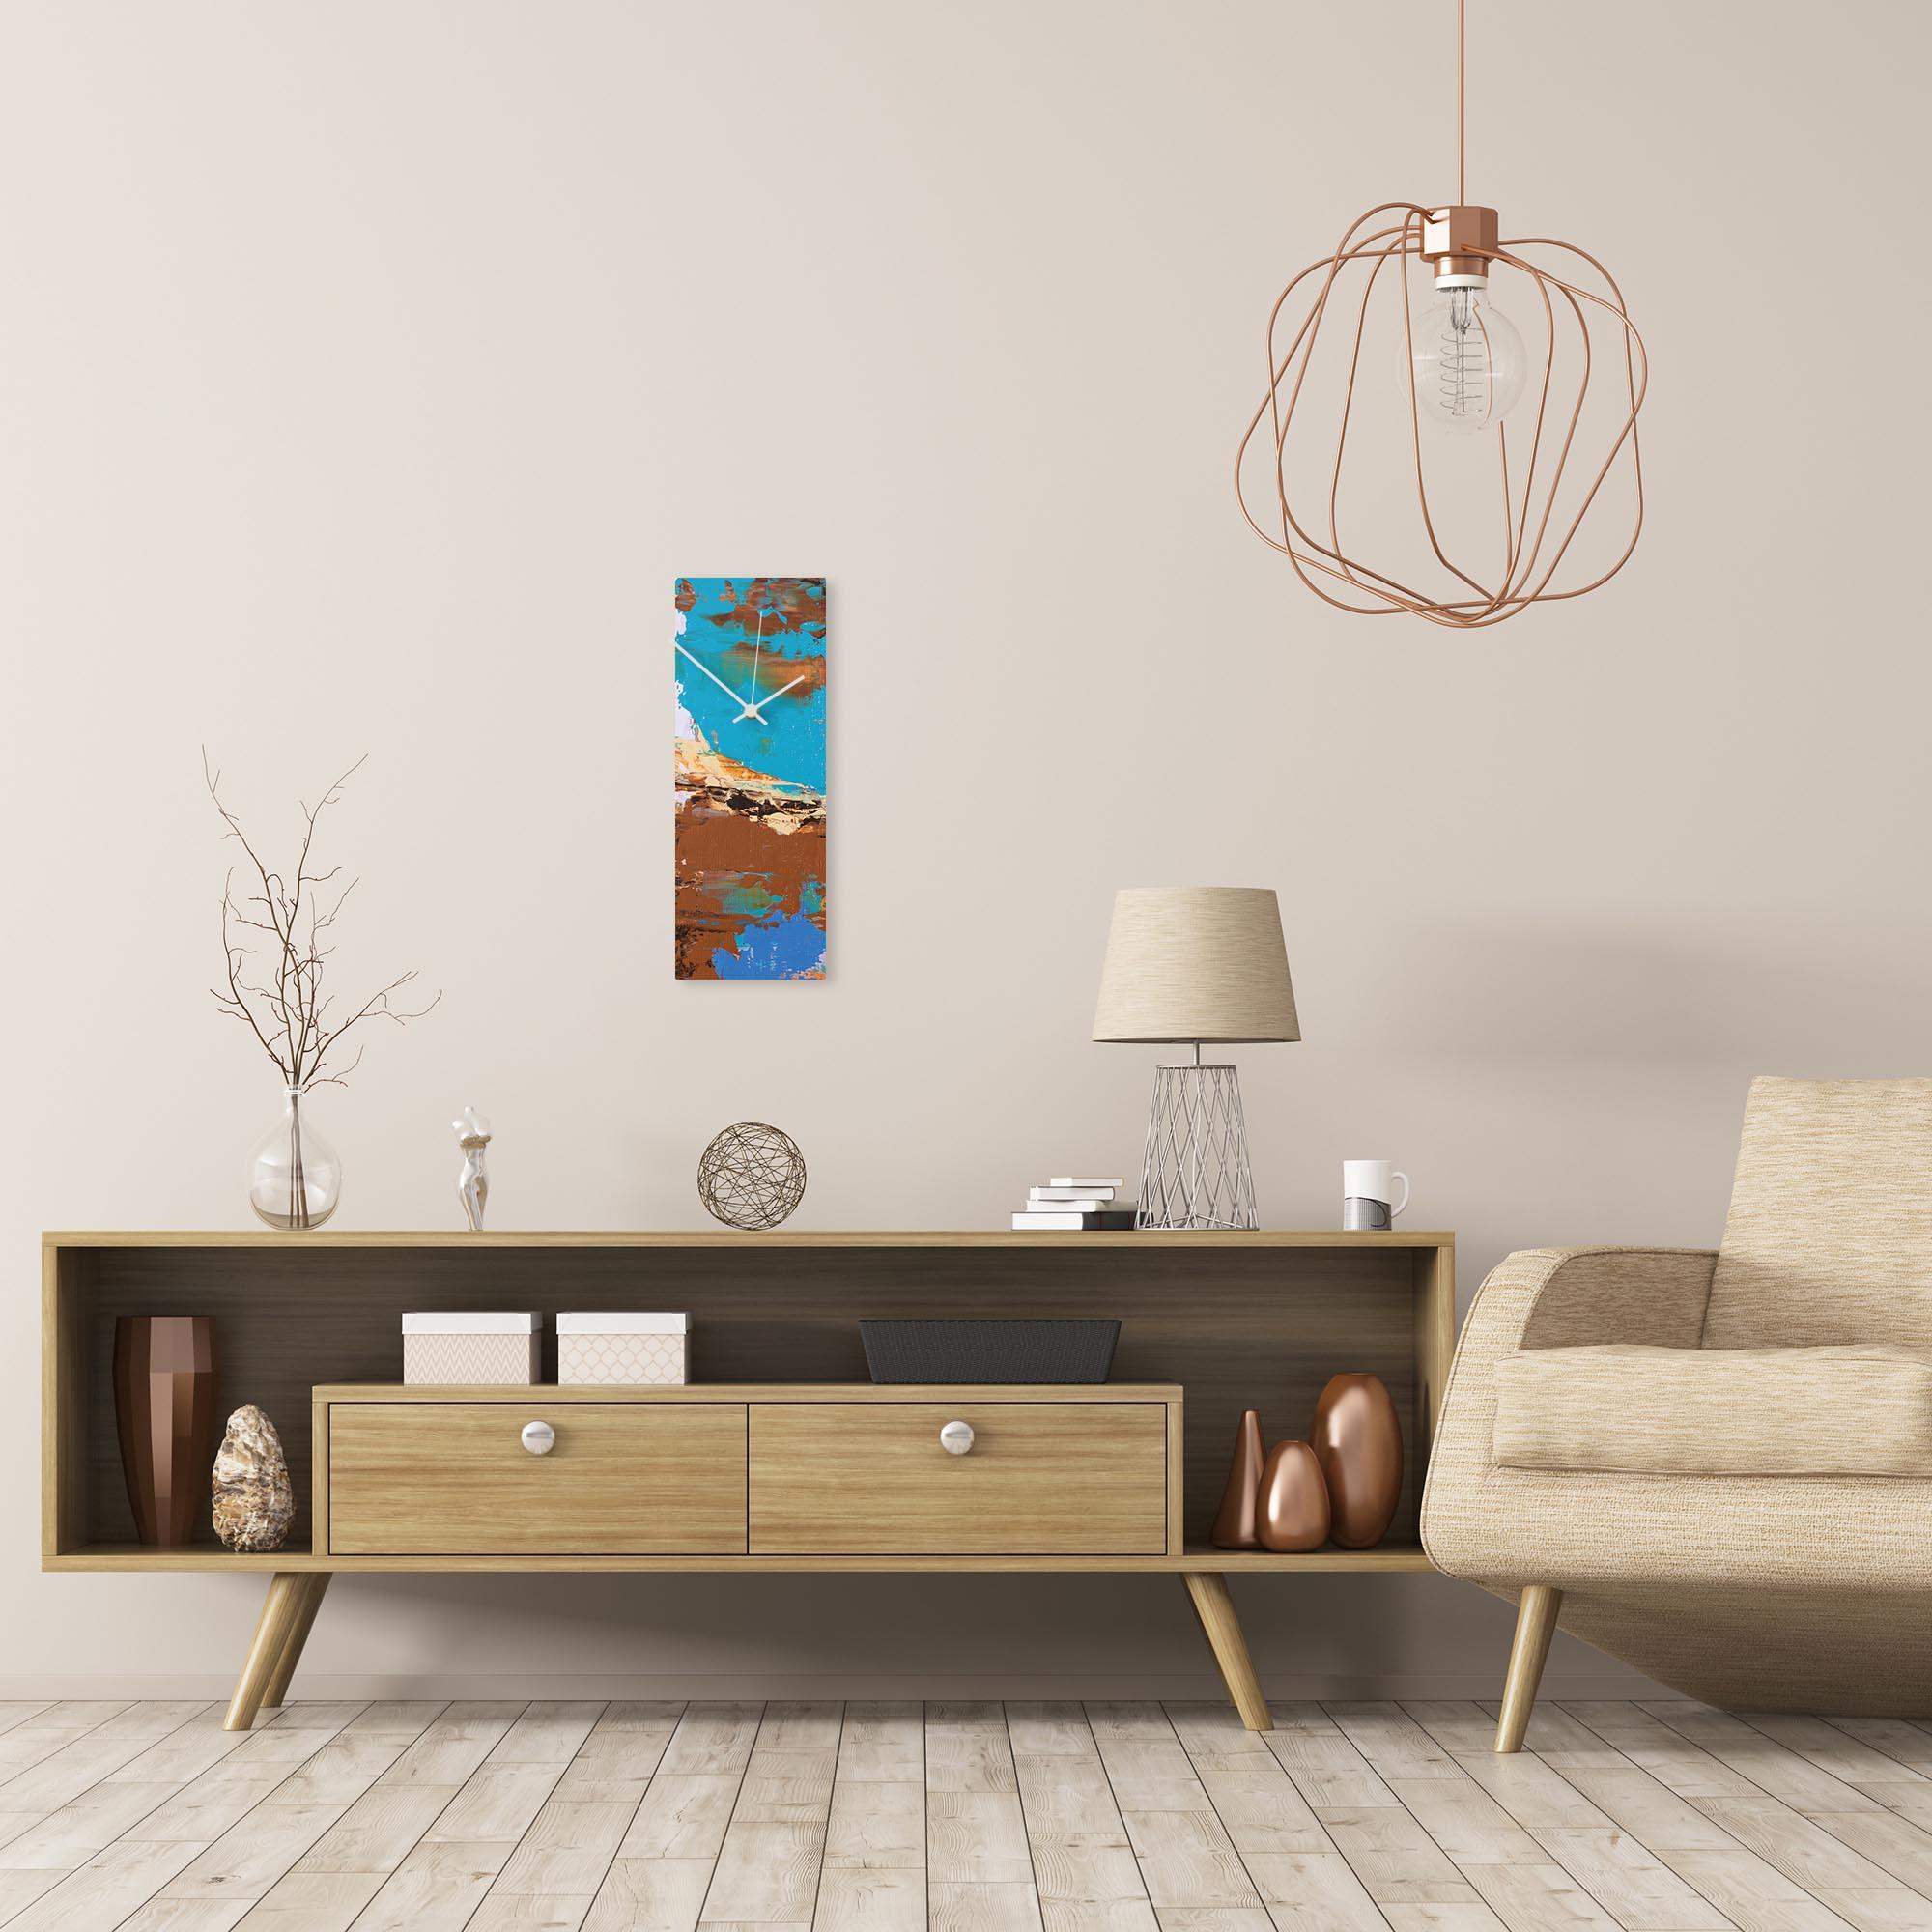 Urban Earth v3 Clock by Elana Reiter Modern Wall Clock on Metal - Alternate View 1